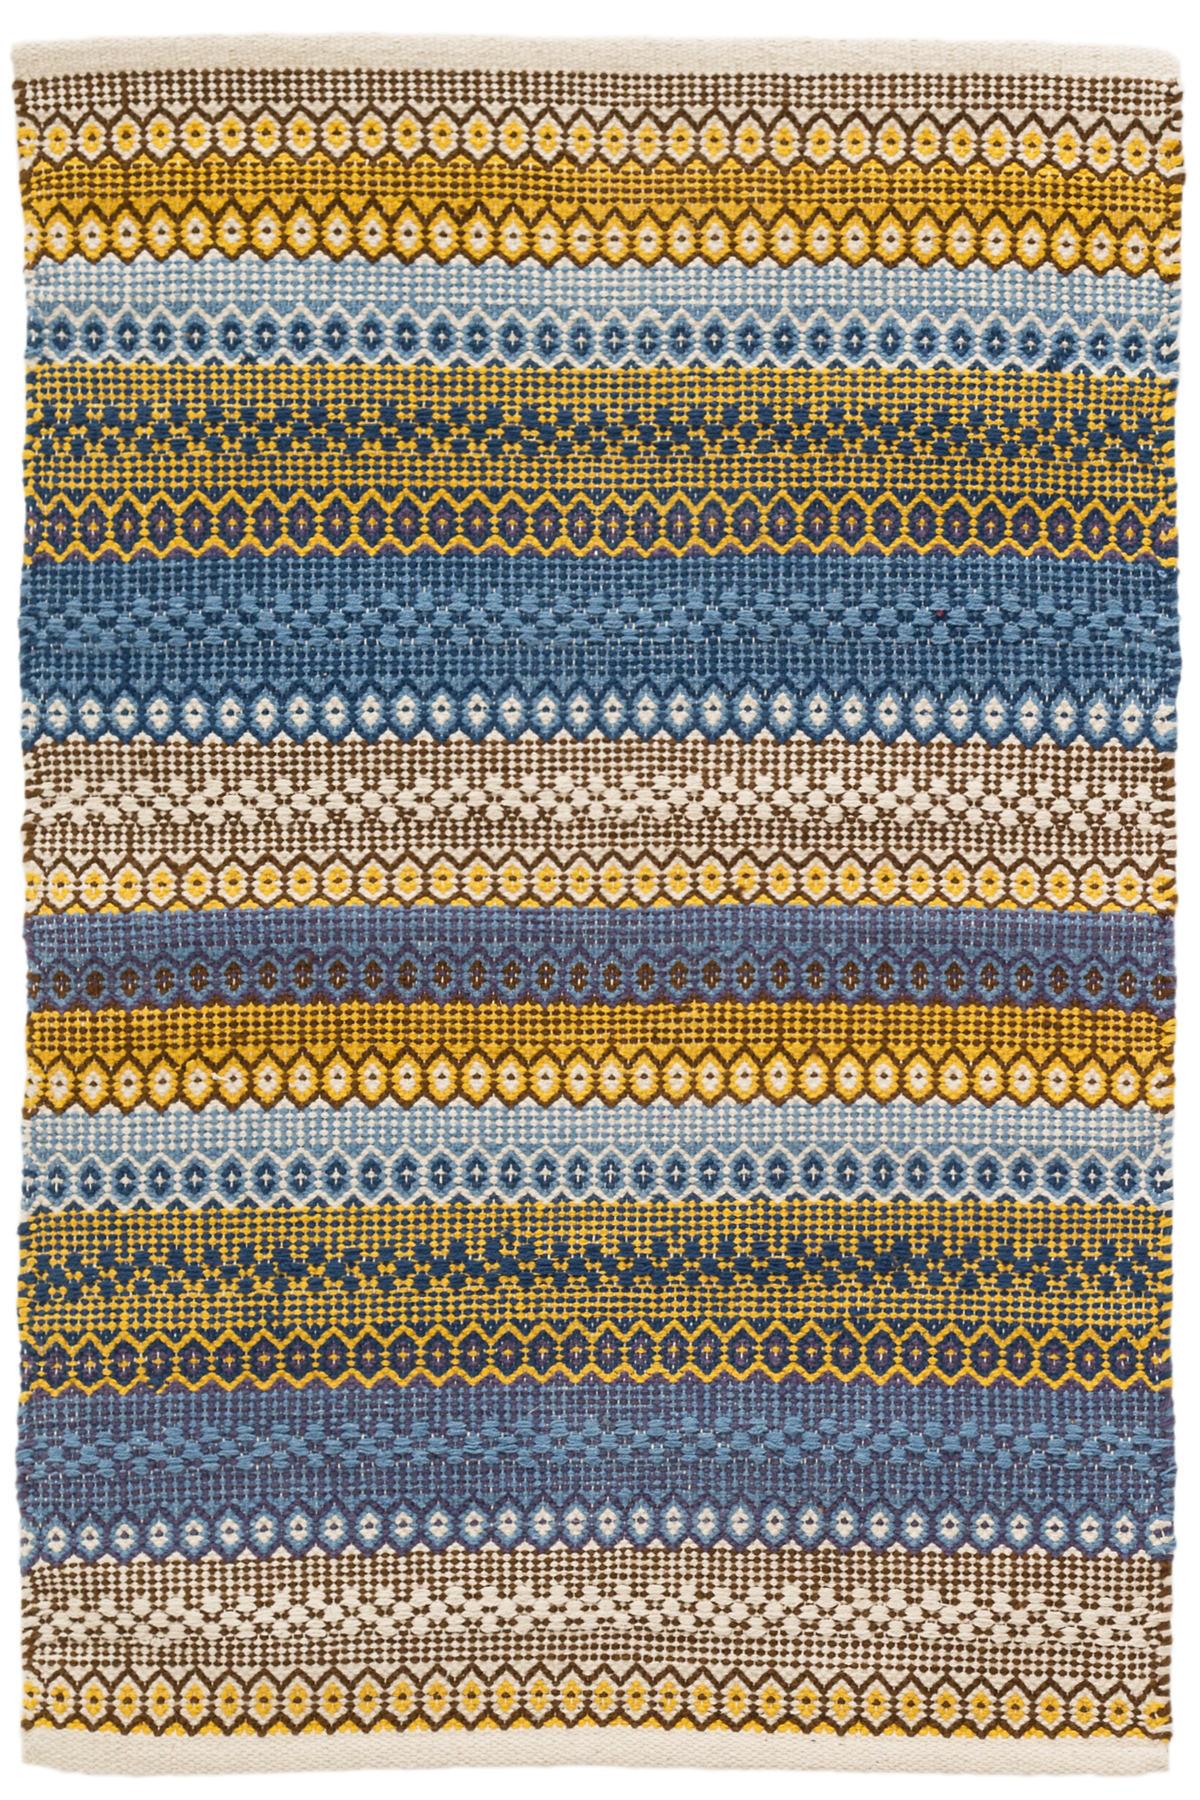 Gypsy Stripe Denim Yellow Woven Cotton Rug Dash Amp Albert